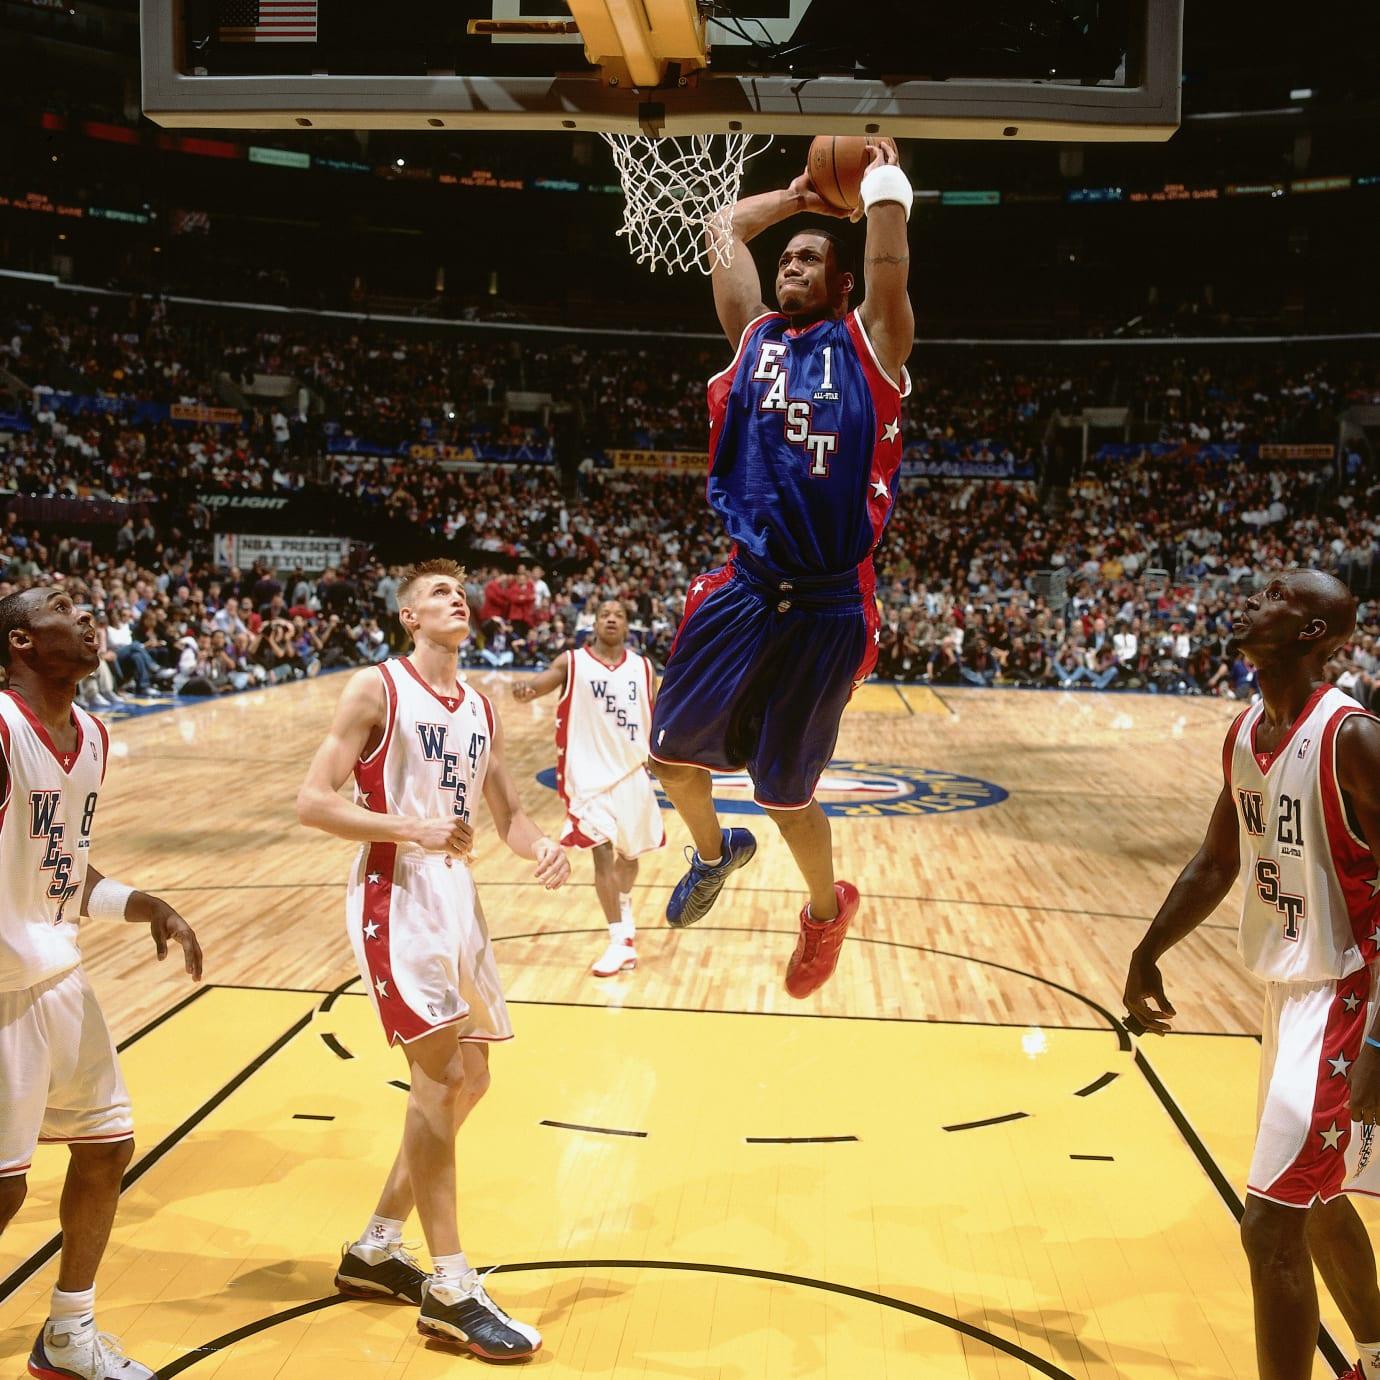 T-Mac 2004 NBA All-Star Game